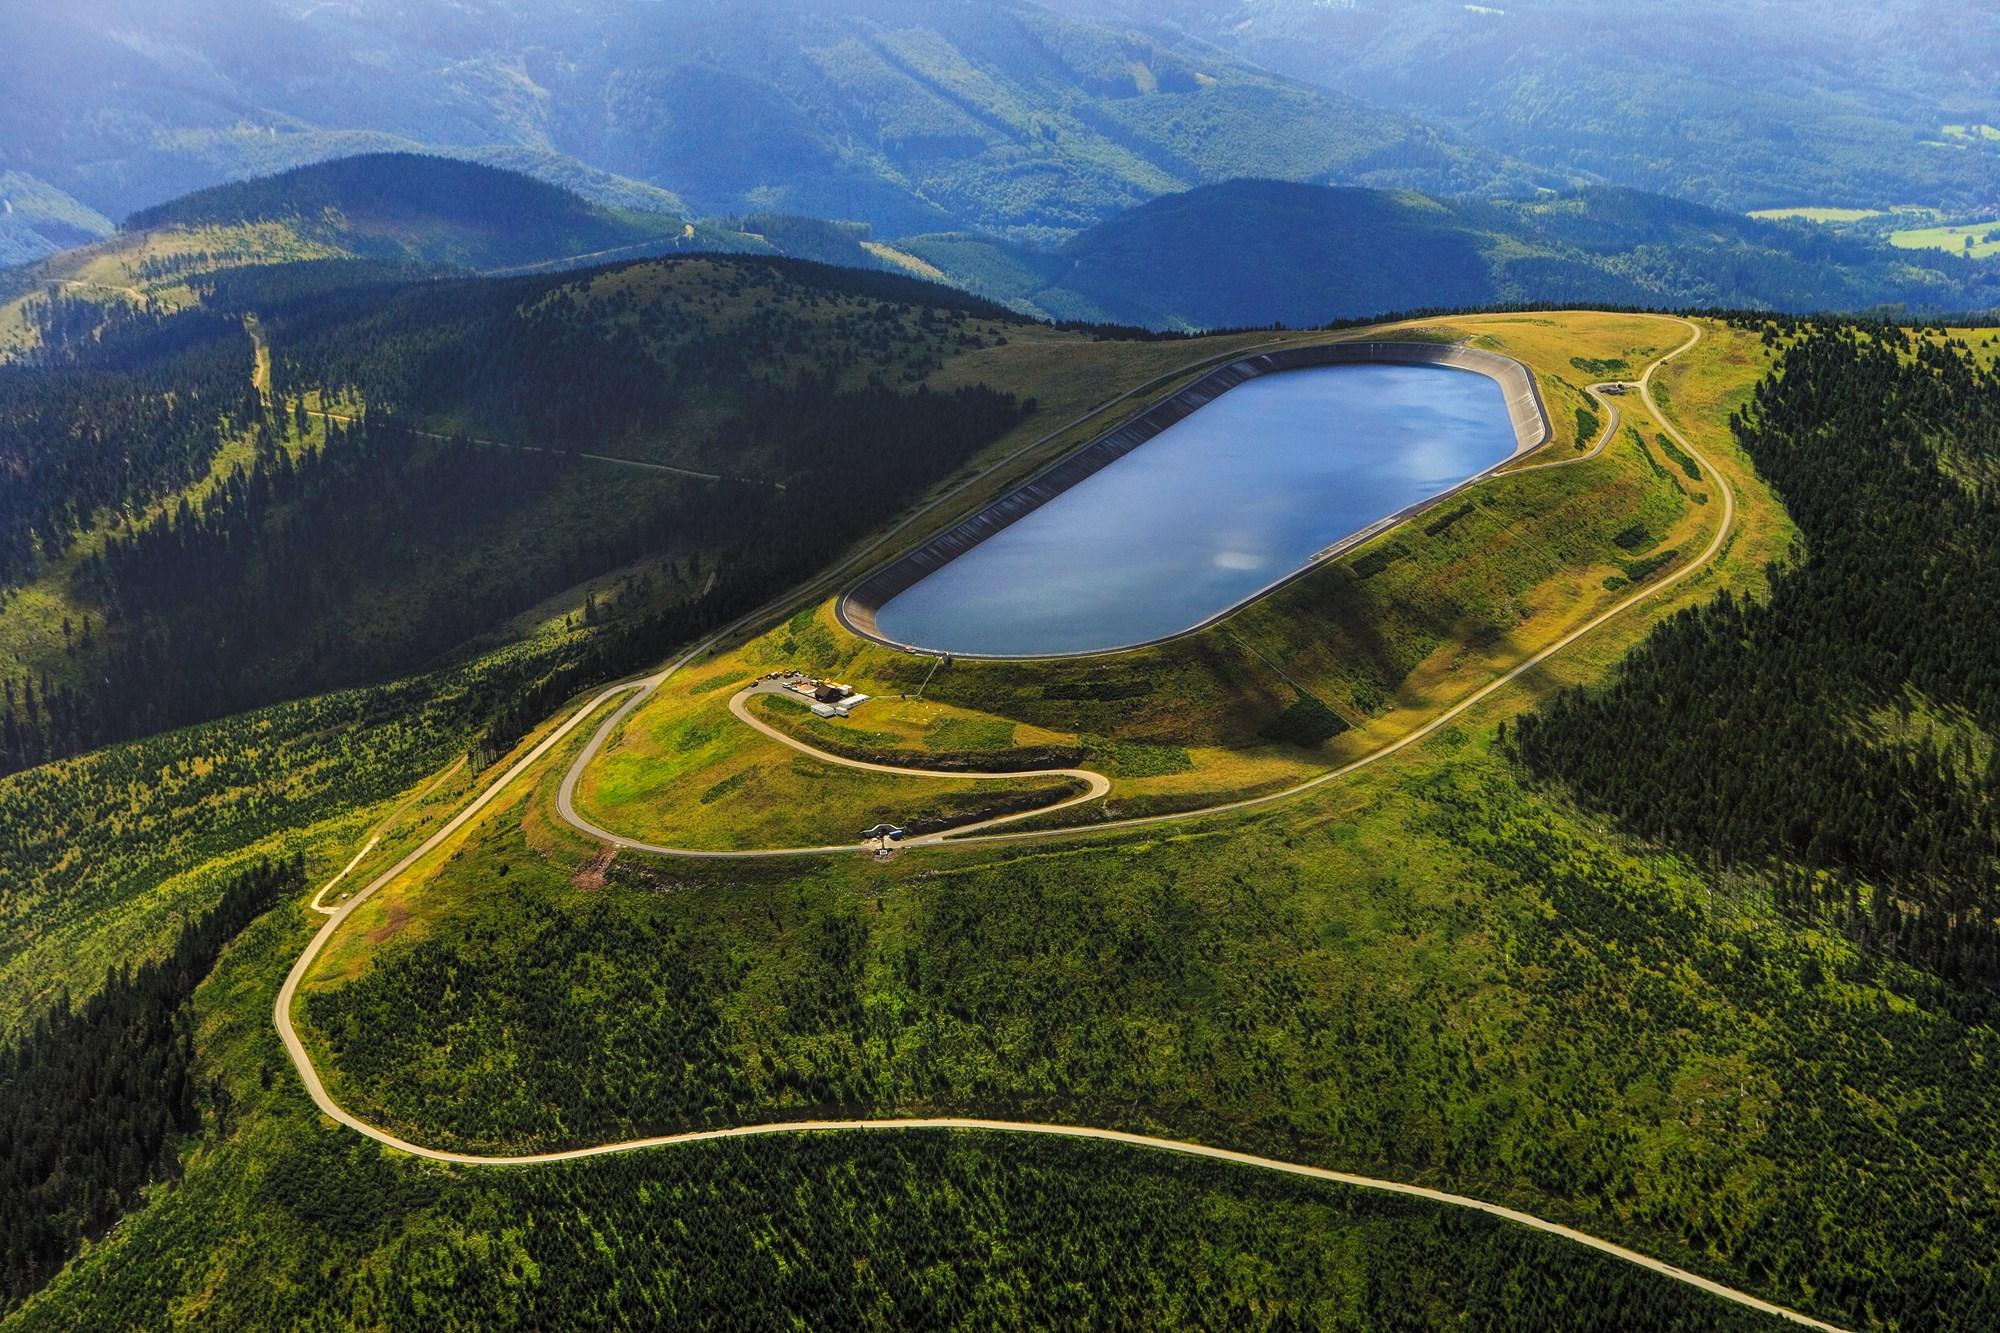 Elektrownia wodna Dlouhe Strane. Fot Libor Sváček